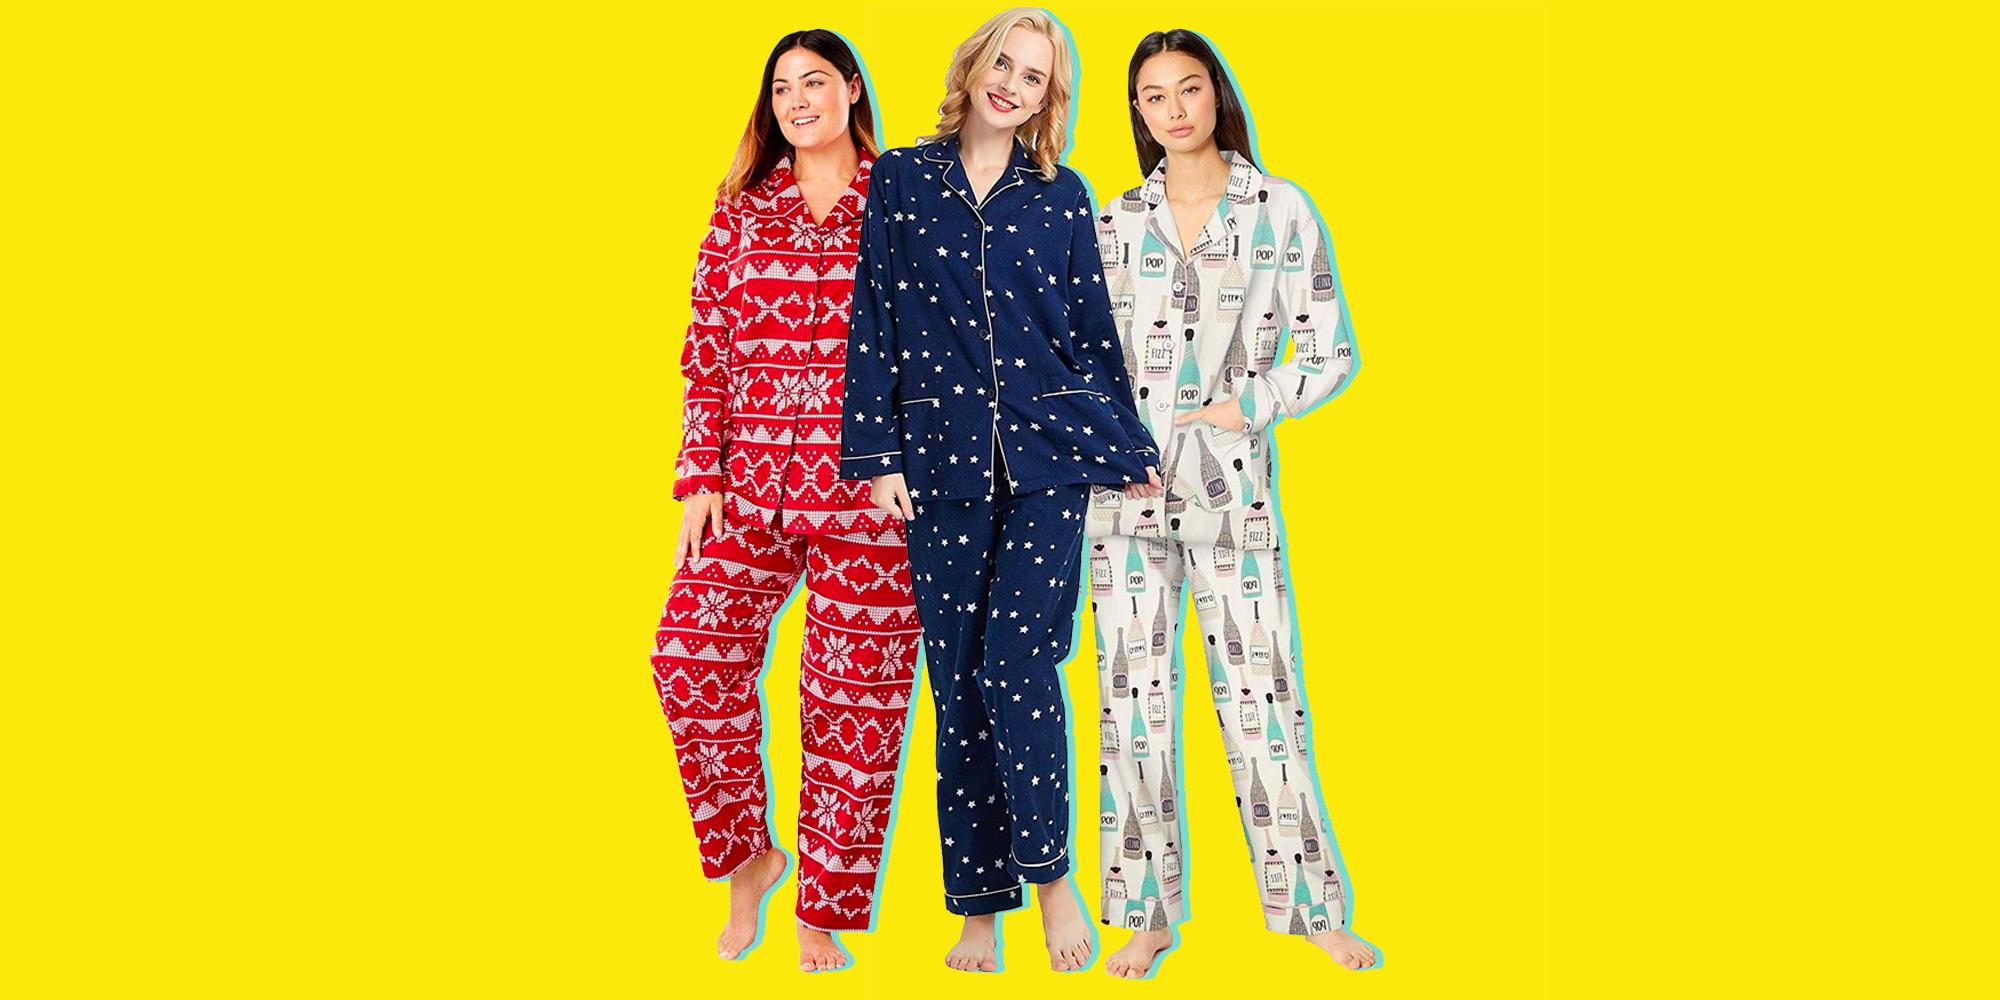 crazy-shop Male Pajama Set Cotton Pajama Man Suit Turn-Down Collar Solid Pyjama Men Full Sleeve Striped Pijama Men XXXL,Men Pyjama Blue,XXL